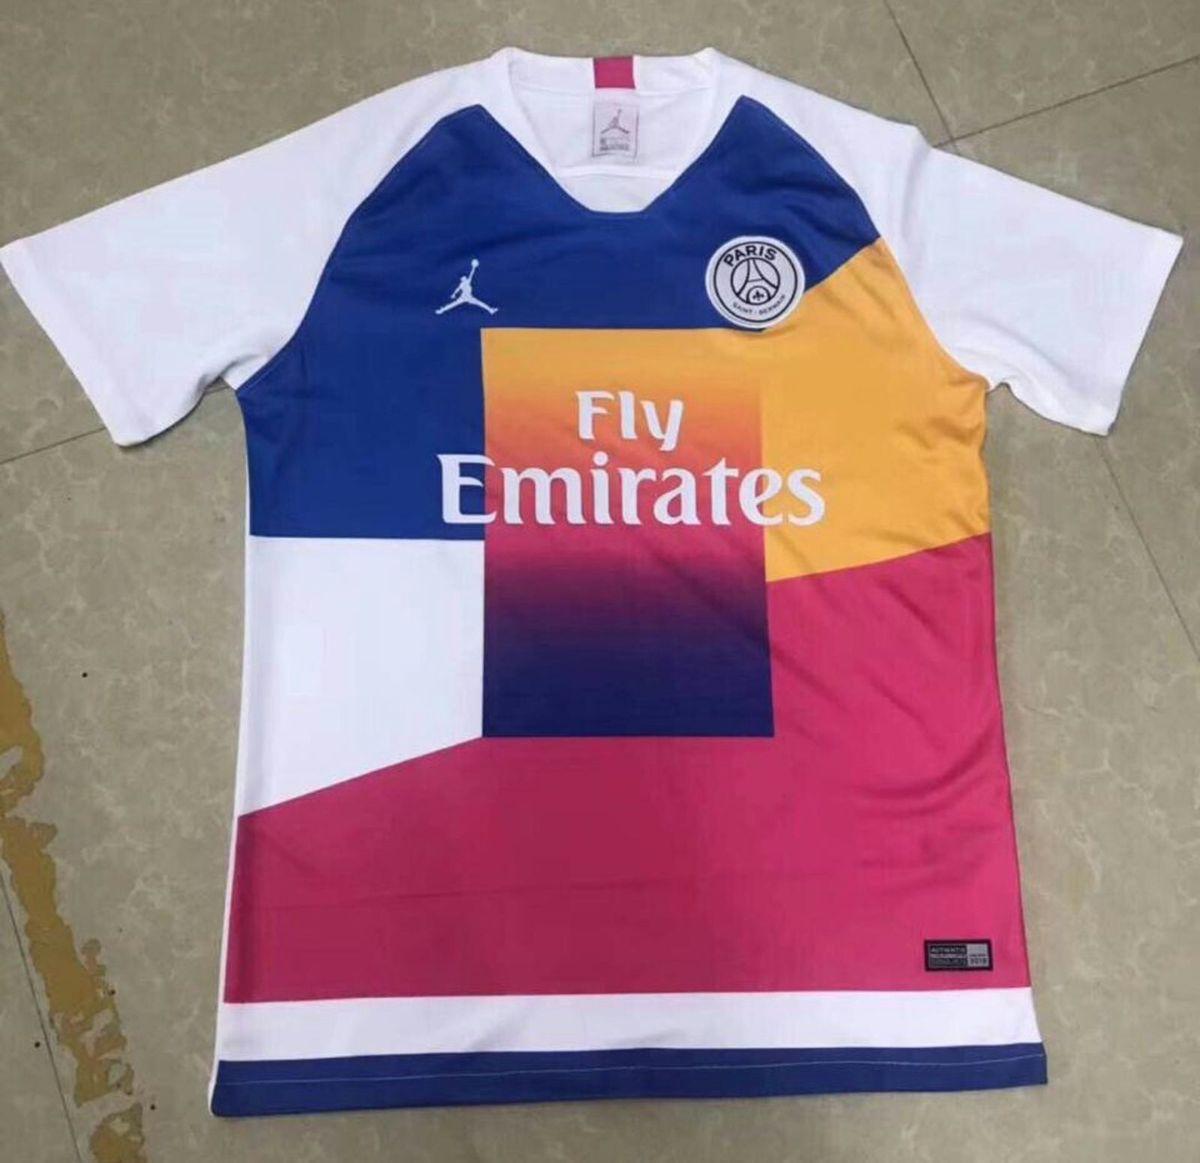 eaa702d2815 camisa do psg jordan colorida importada pronta entrega - esportes nike  jordan